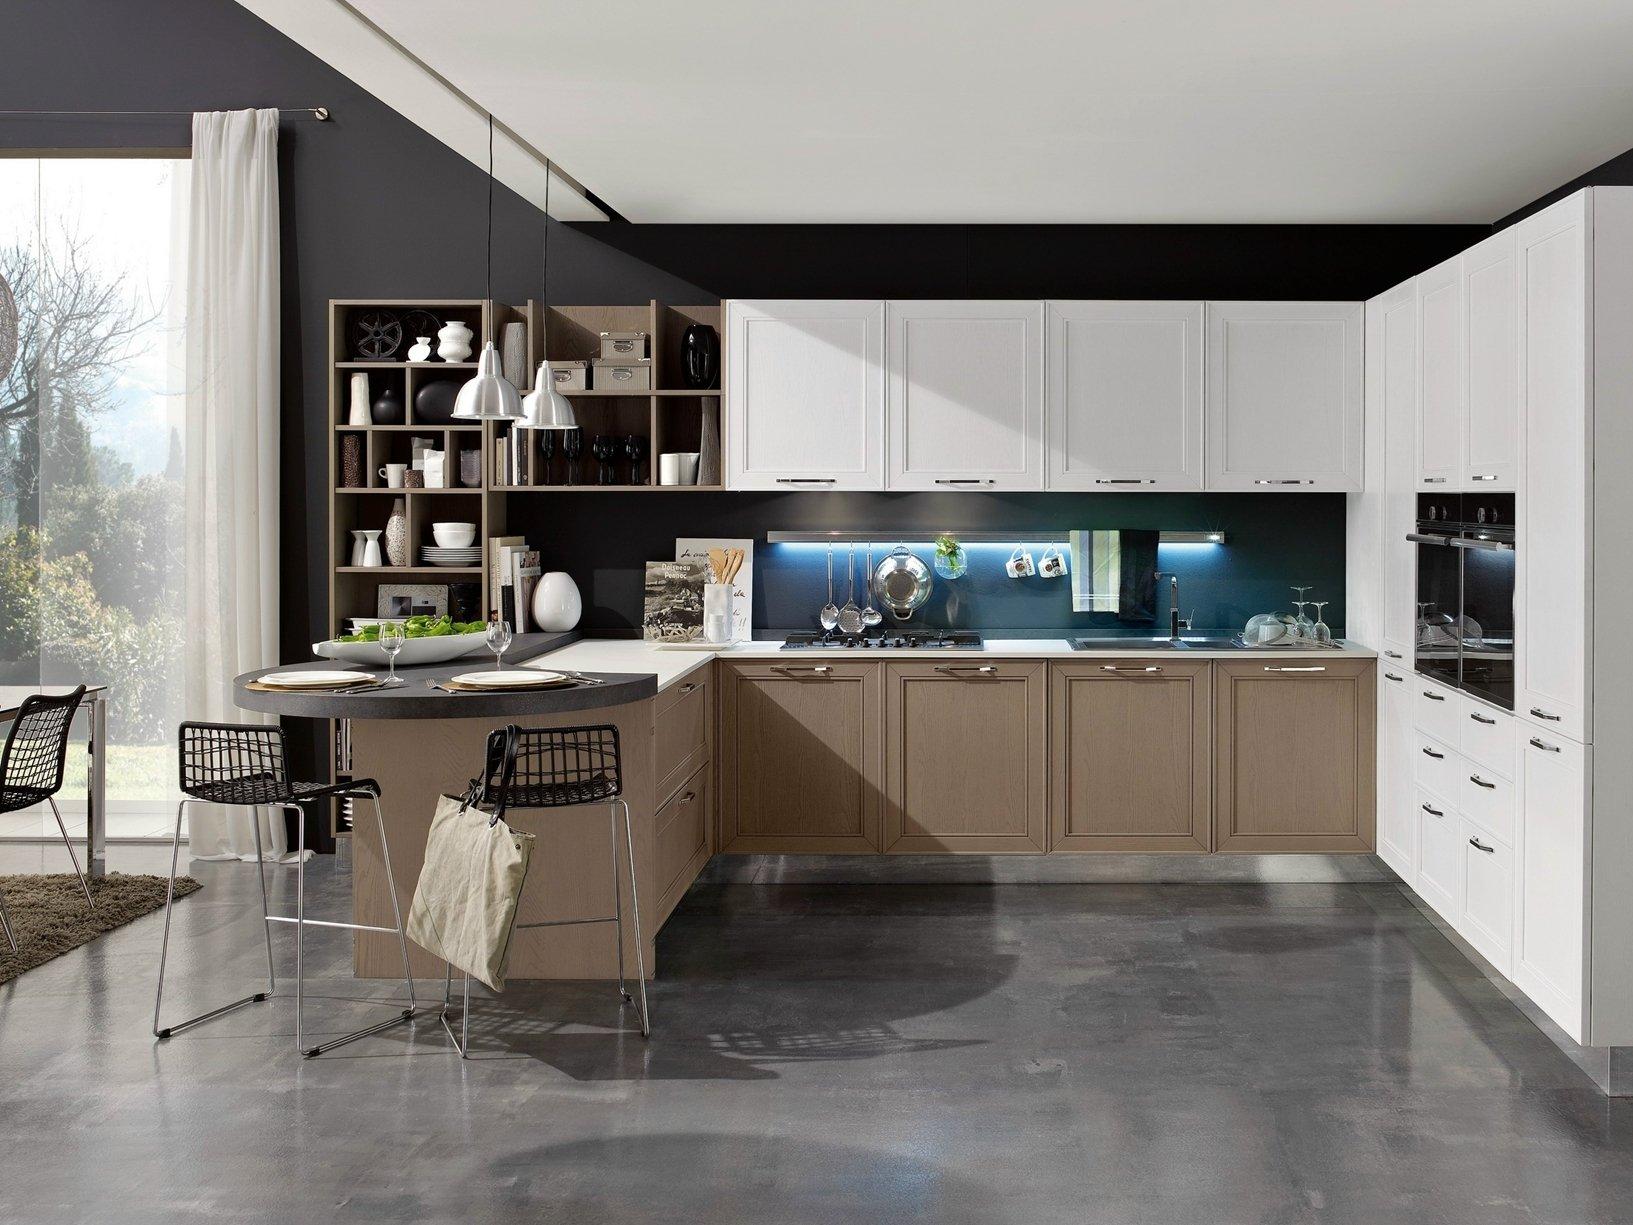 Stosa cucine presenta maxim for Cucine foto